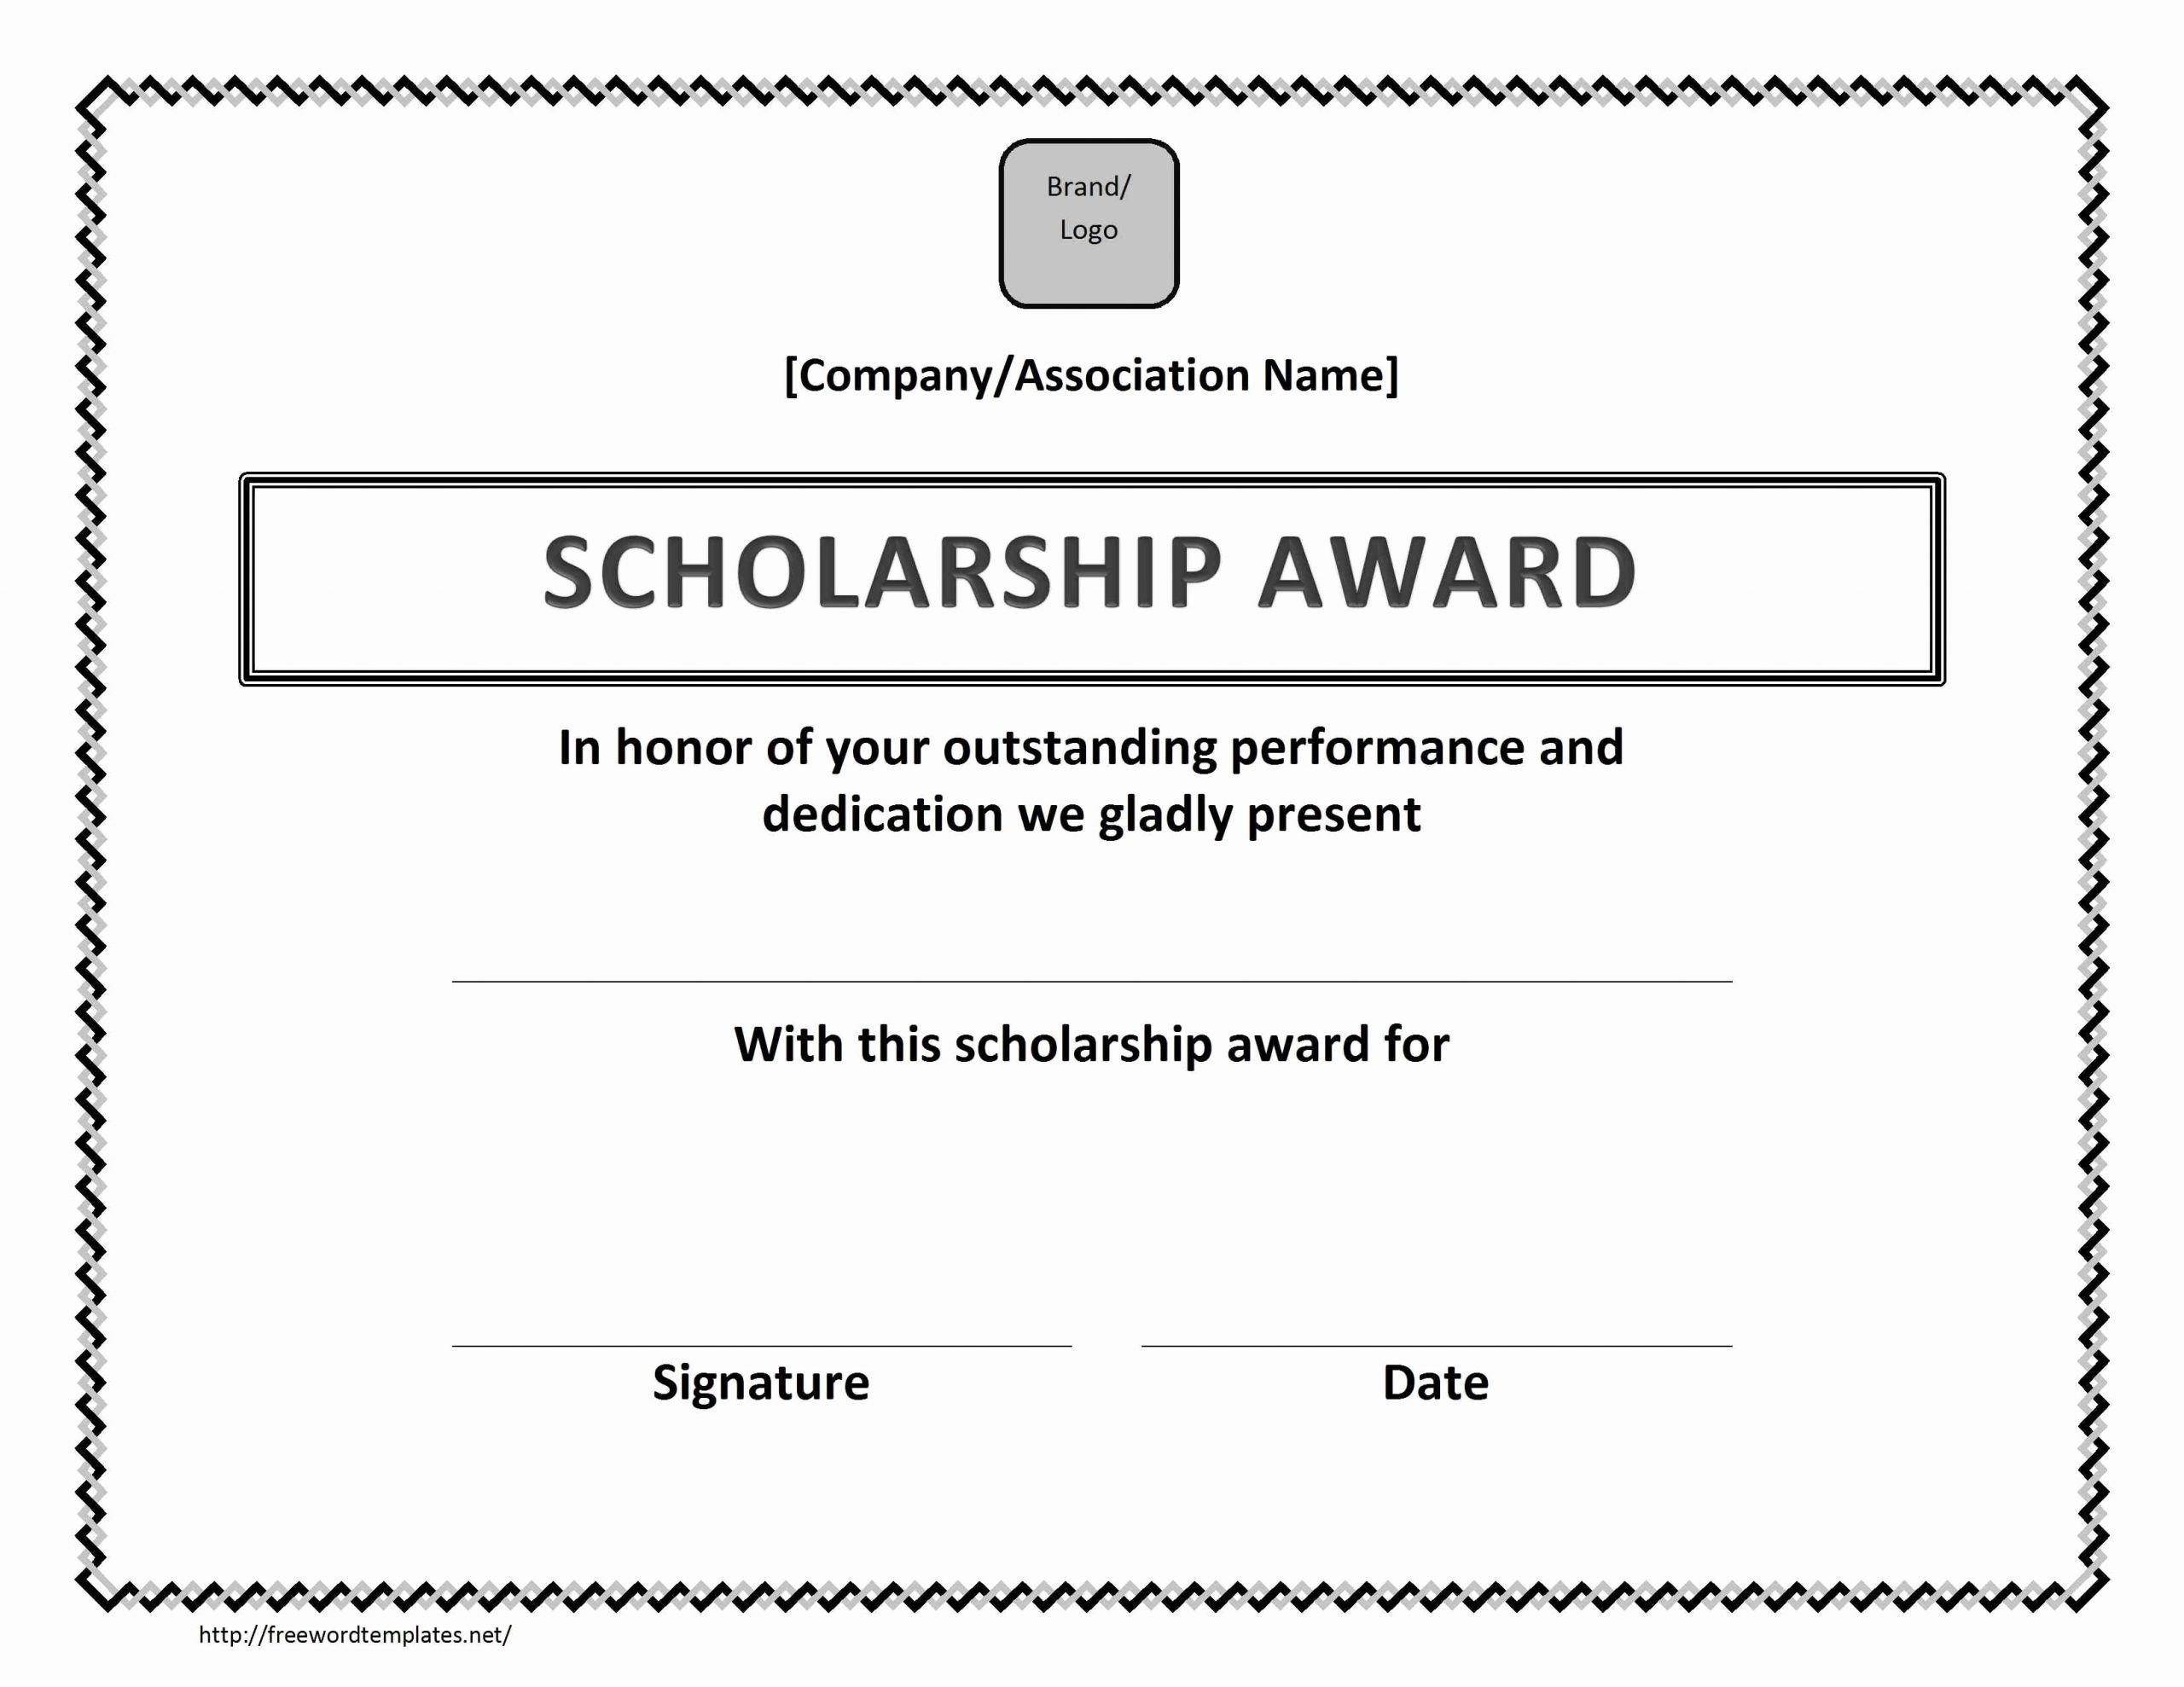 Scholarship Certificate Template Free Unique Scholarship Award Certificate Template